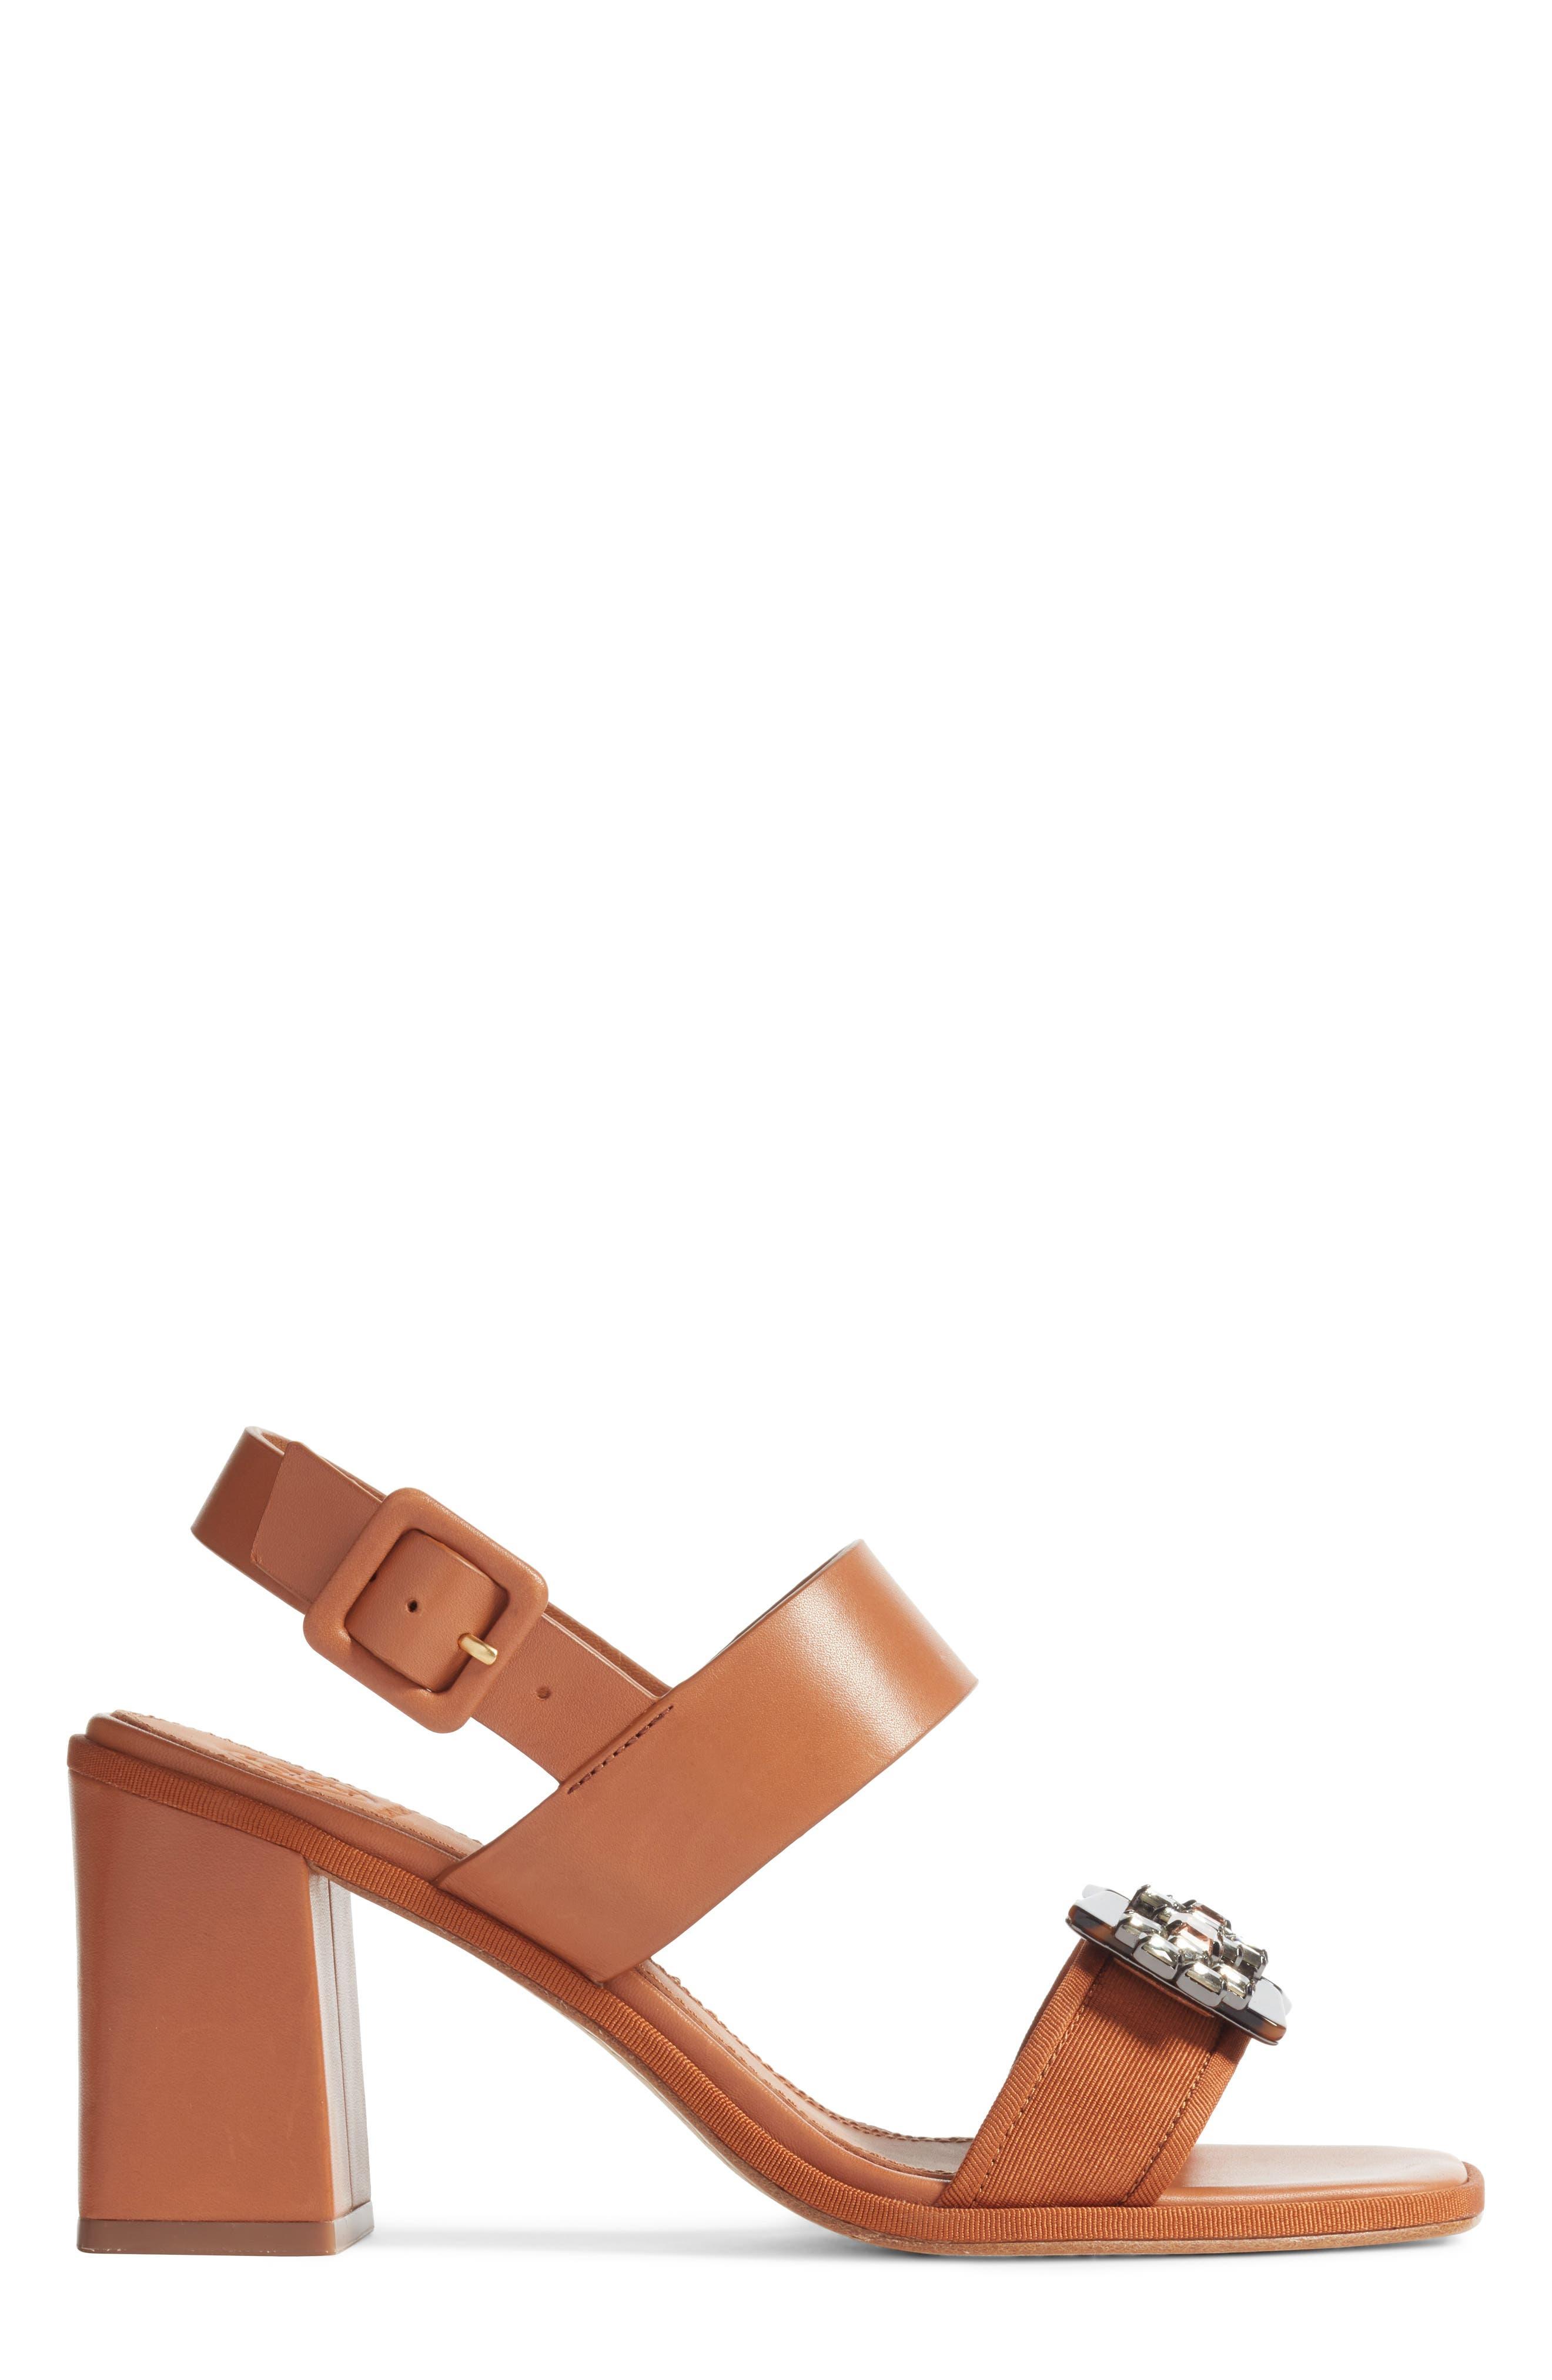 Delaney Embellished Double Strap Sandal,                             Alternate thumbnail 3, color,                             Tan/ Tan